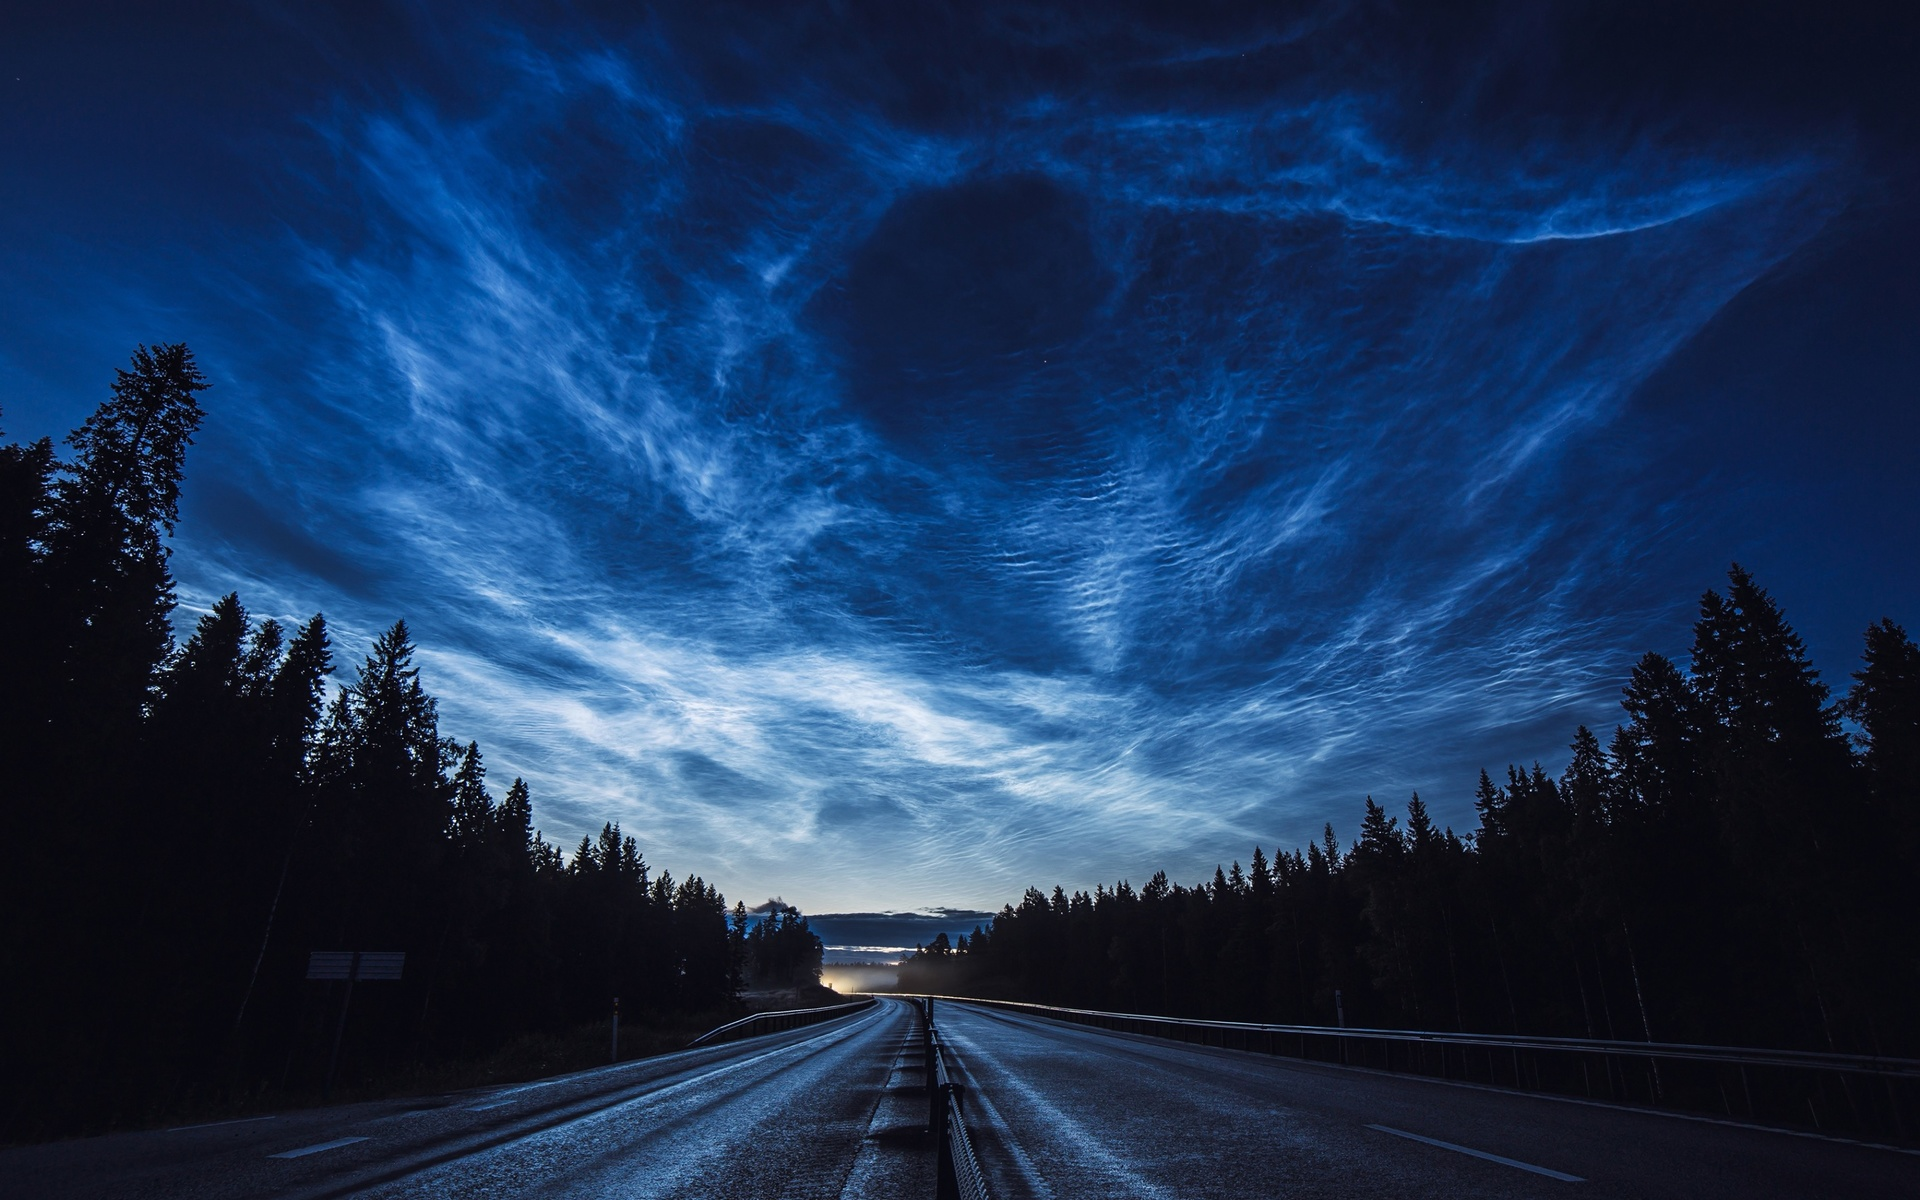 дорога, ночь, лес, небо, road, night, forest, sky